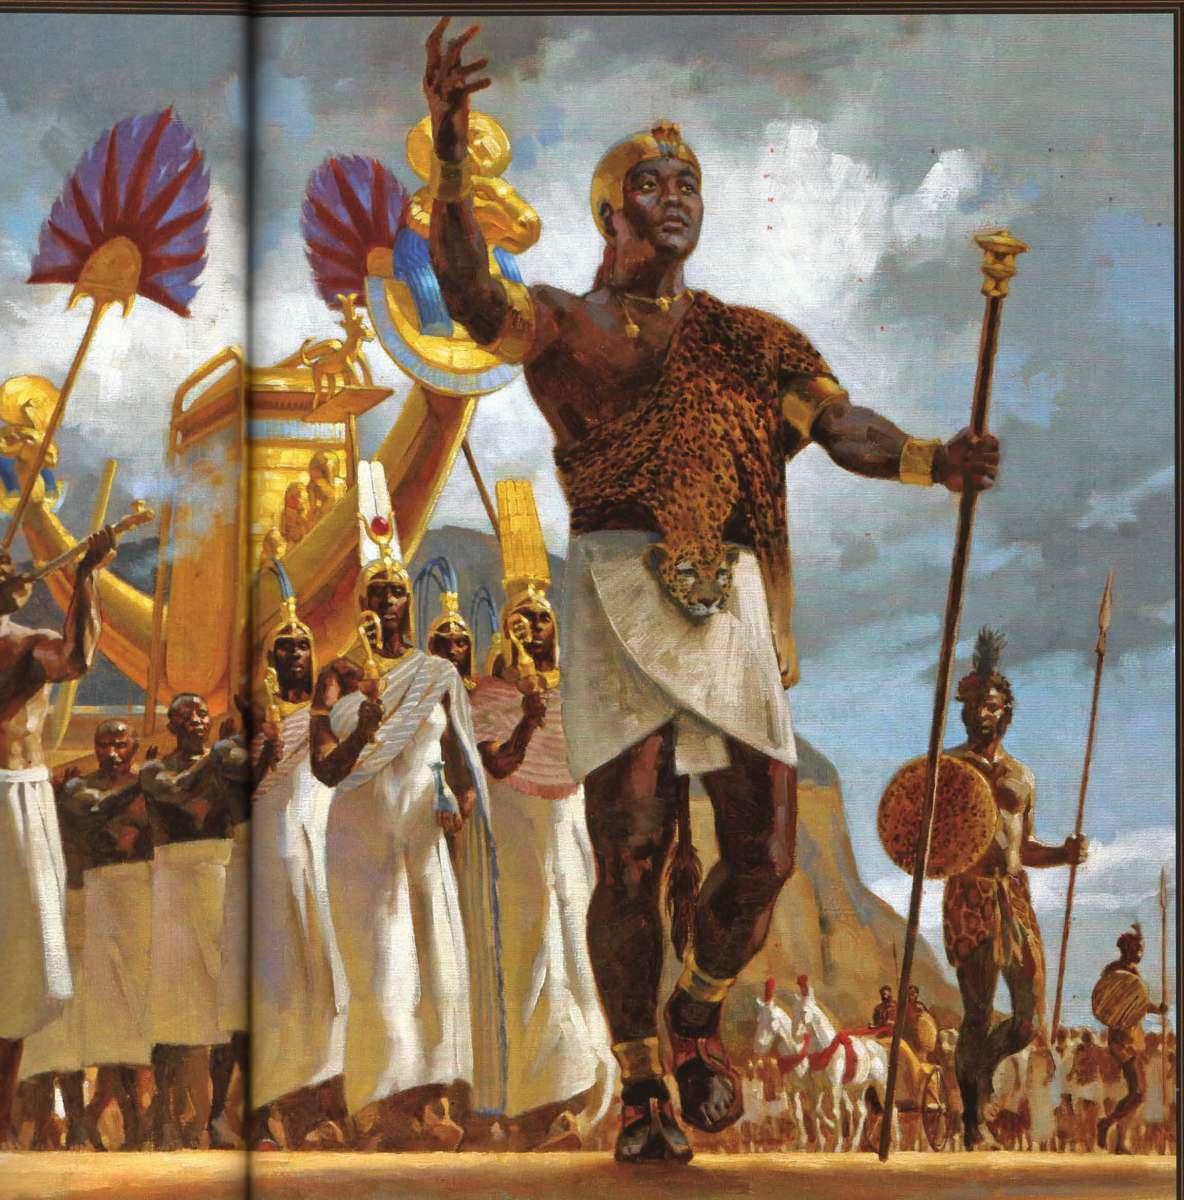 Pharaoh Piye and his Army and entourage